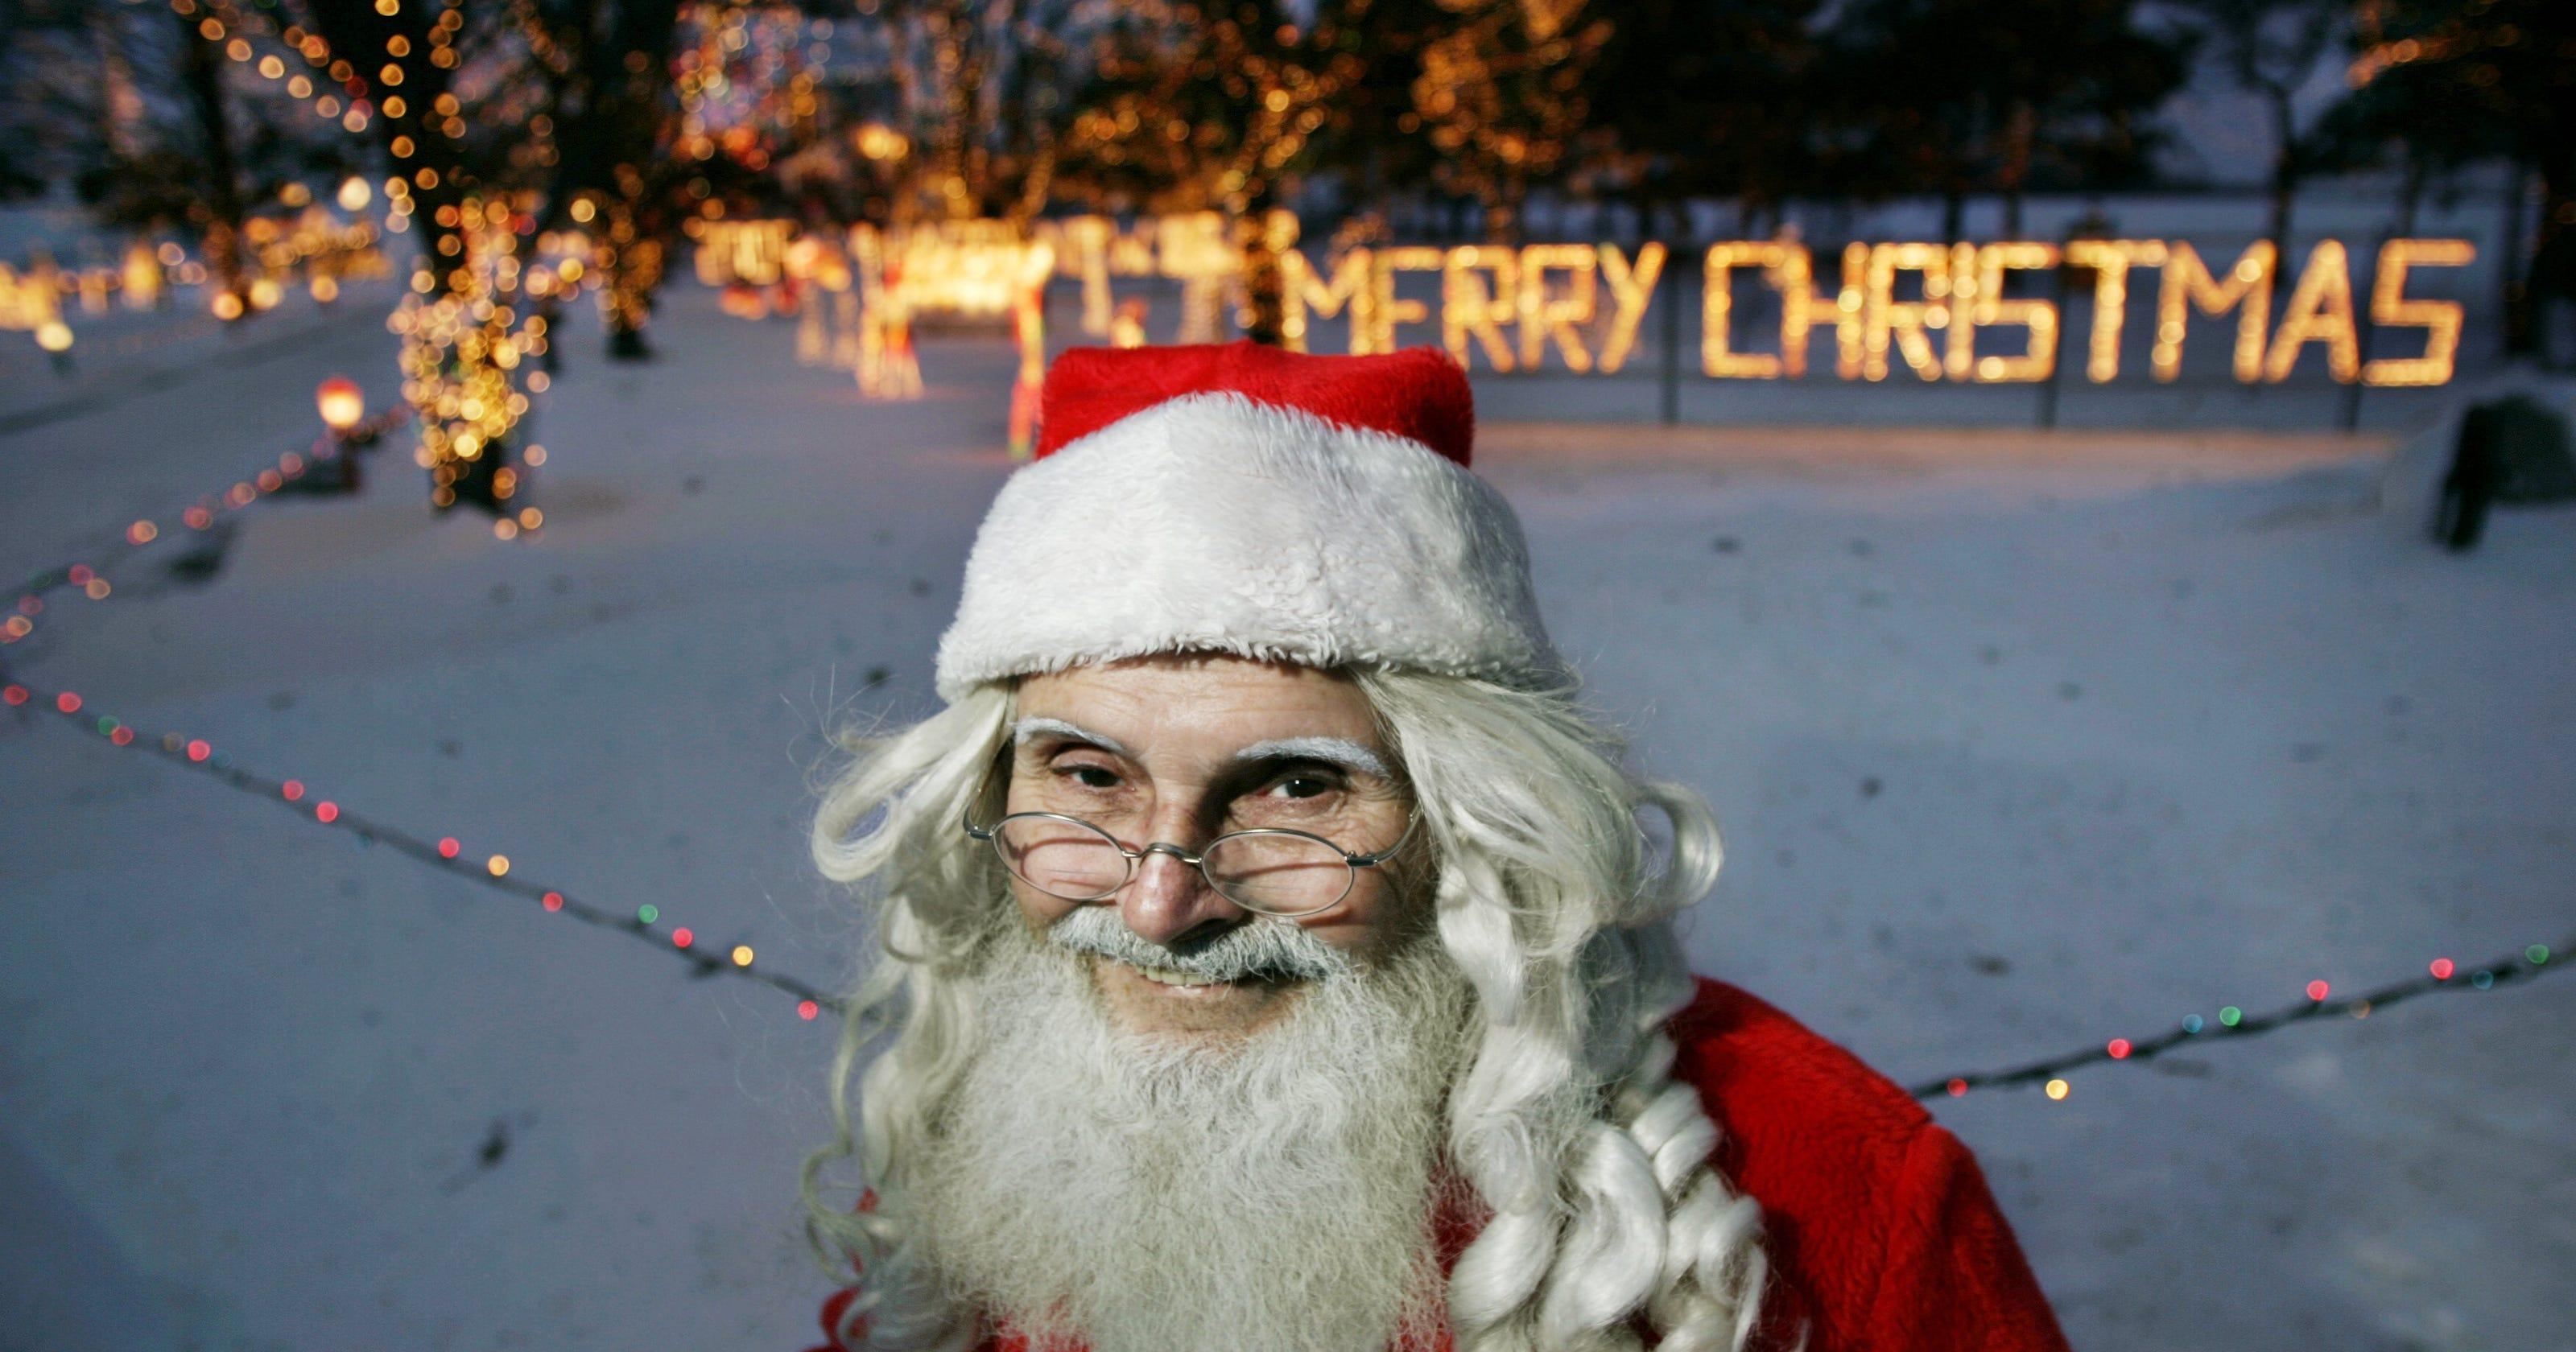 Christmas light displays start after